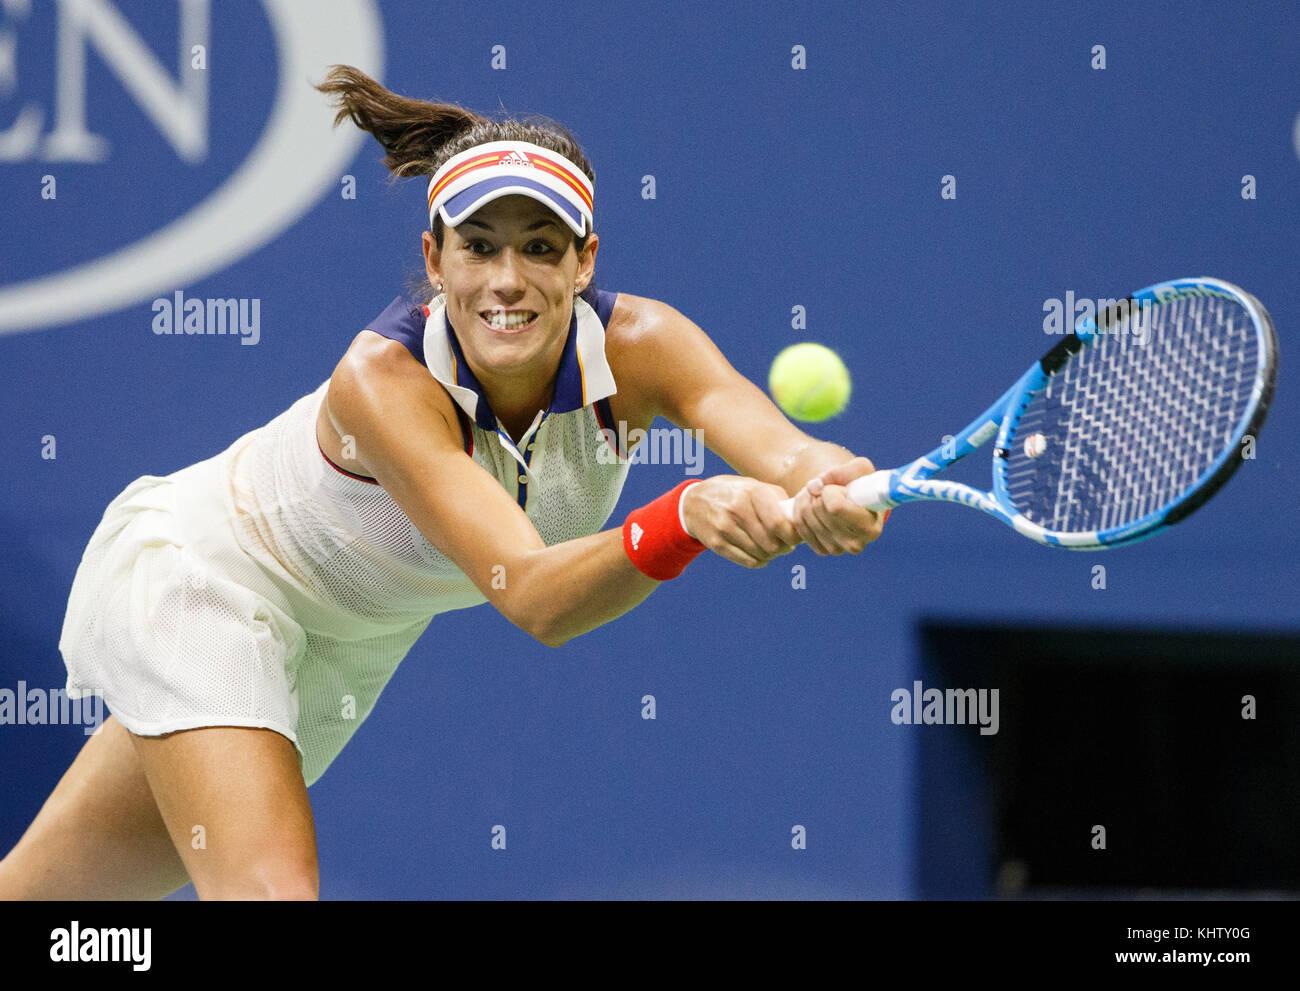 "Spanish  tennis player GARBI""E MUGURUZA (ESP) hitting a backhand shot during women's singles match in US Open - Stock Image"